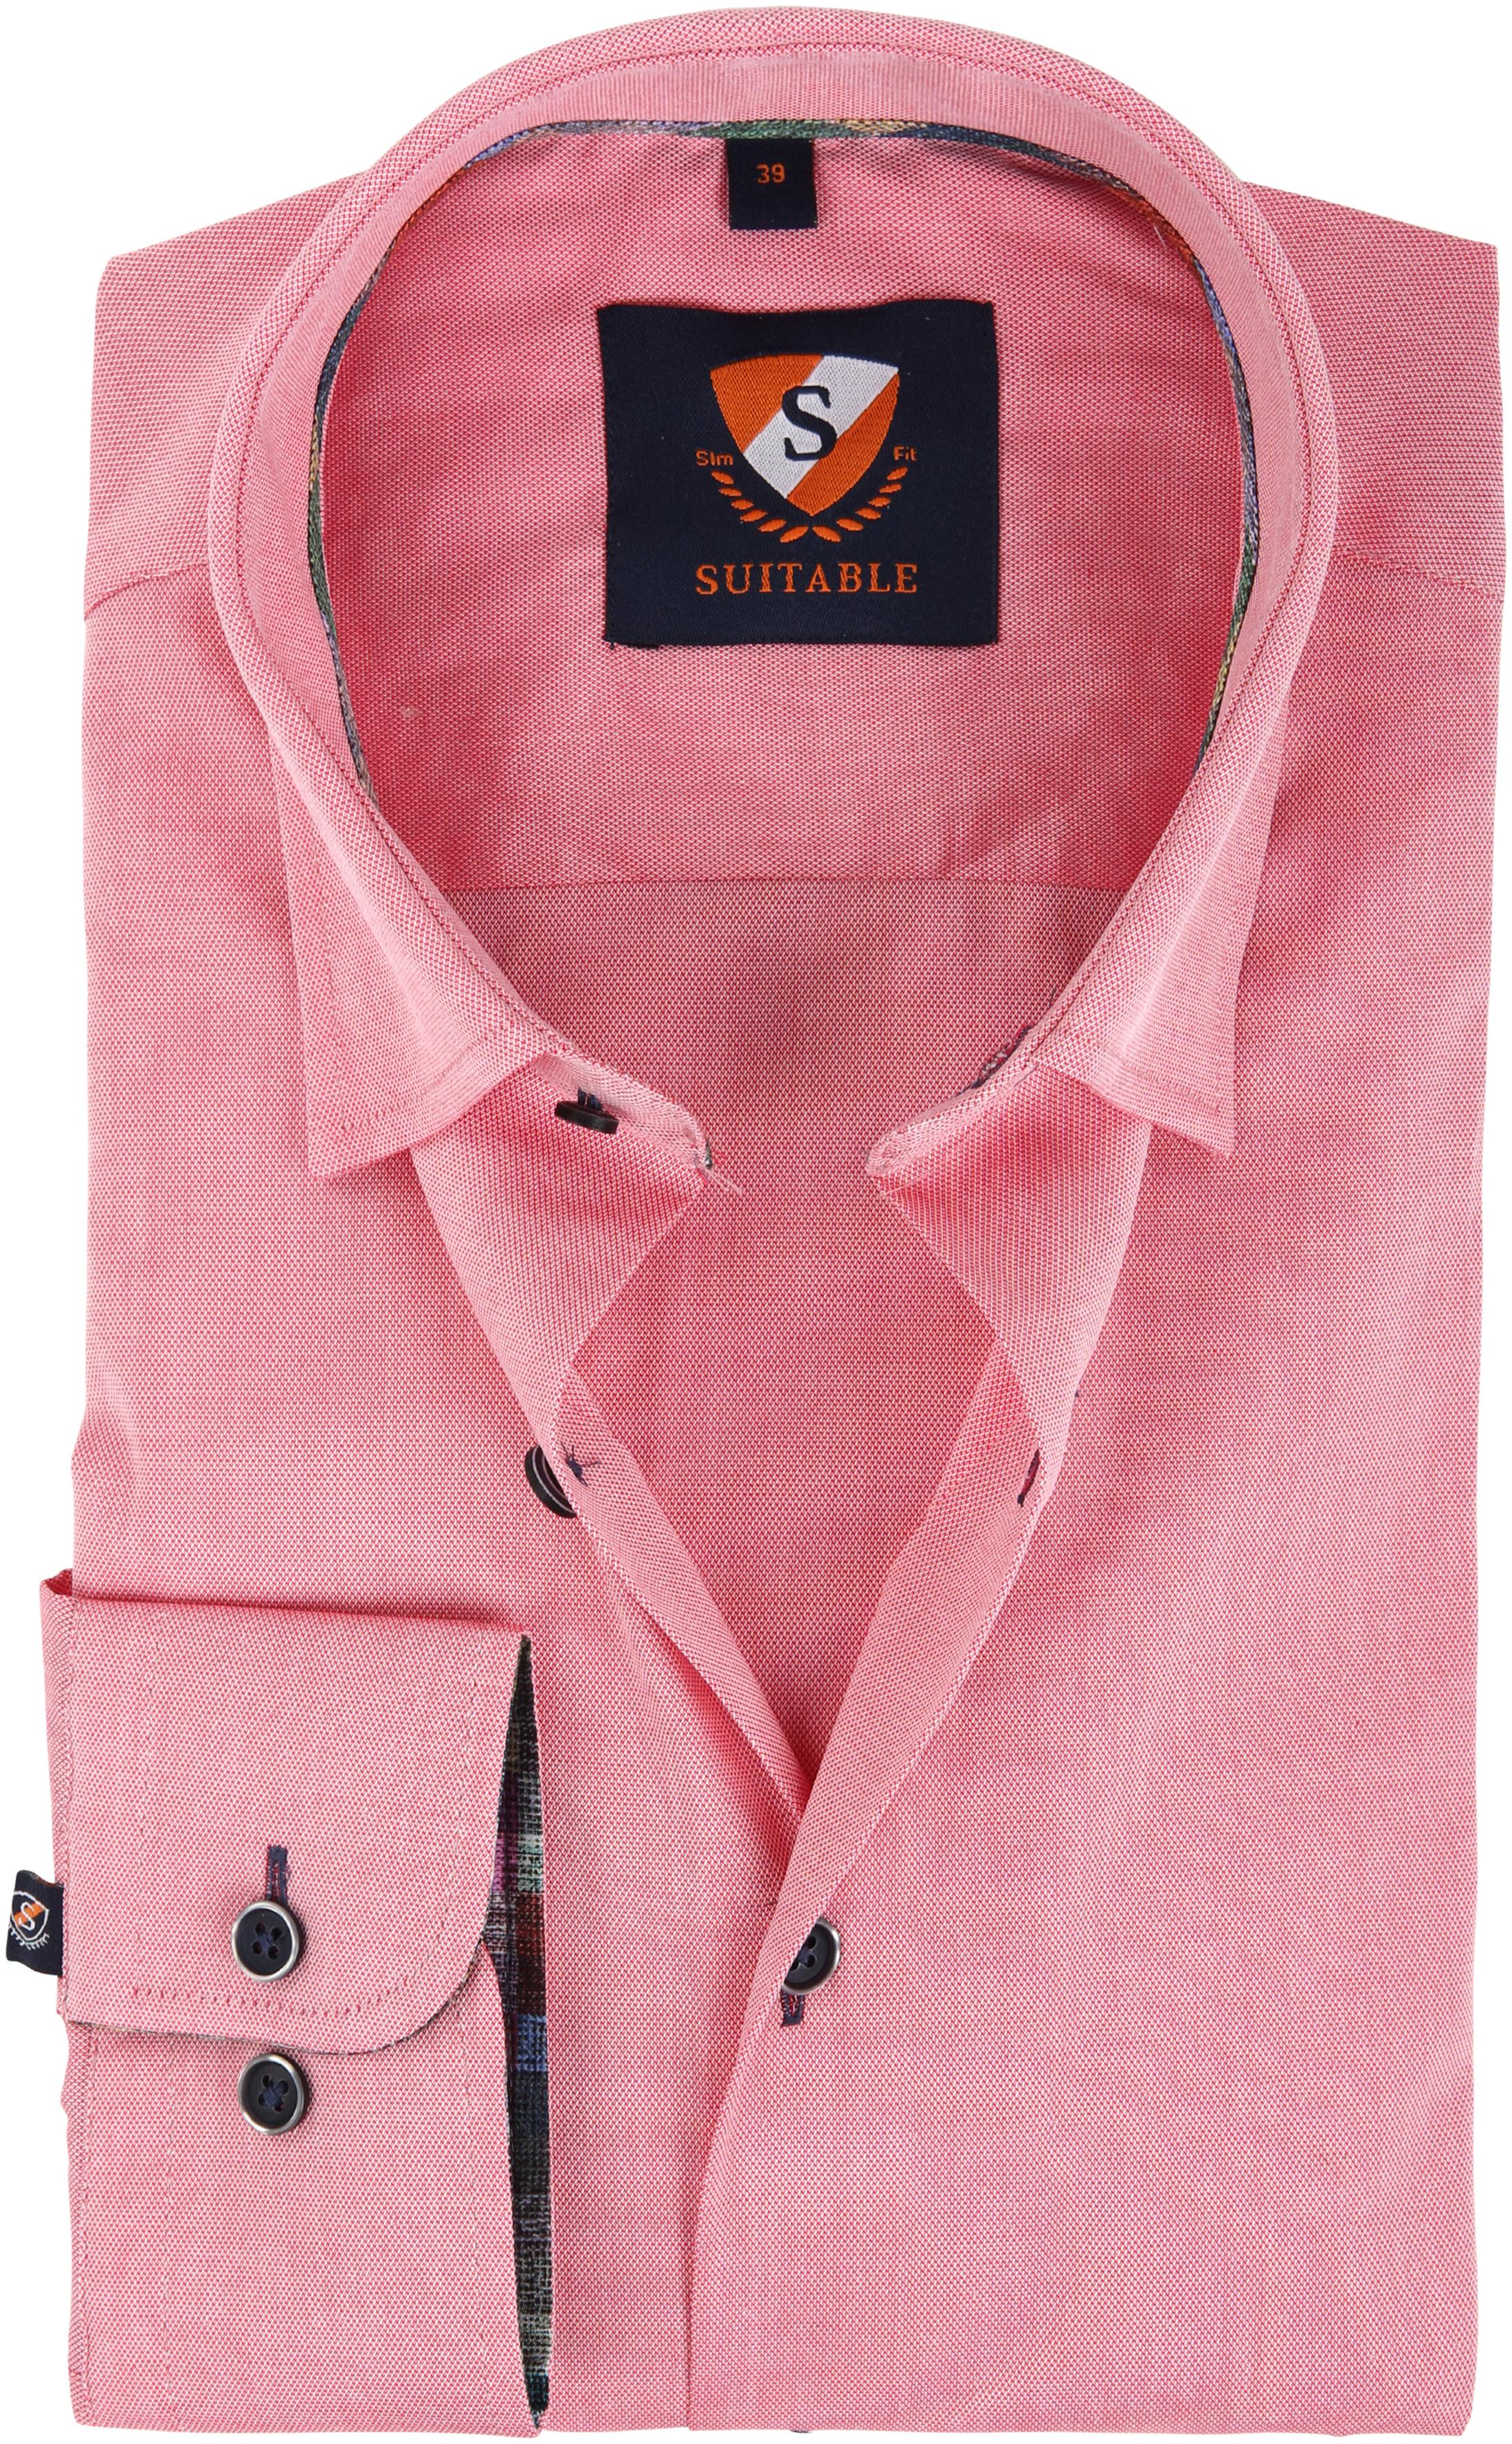 Suitable Overhemd Donkerroze 183-4 foto 0